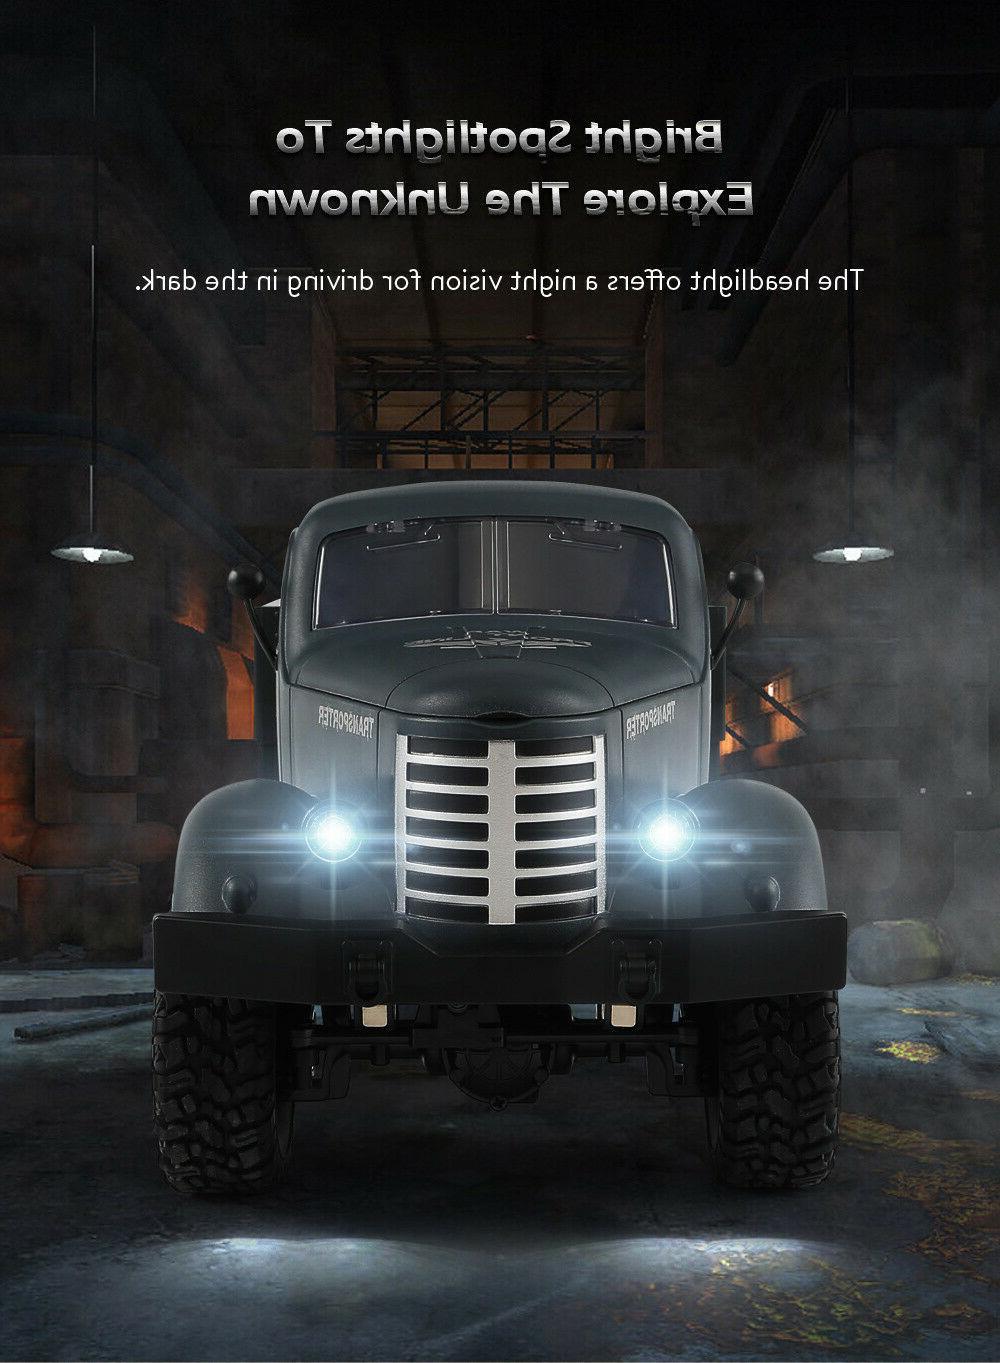 JJRC Q60 1/16 2.4G 6WD Off-Road Retro WW2 Military/Army Truc